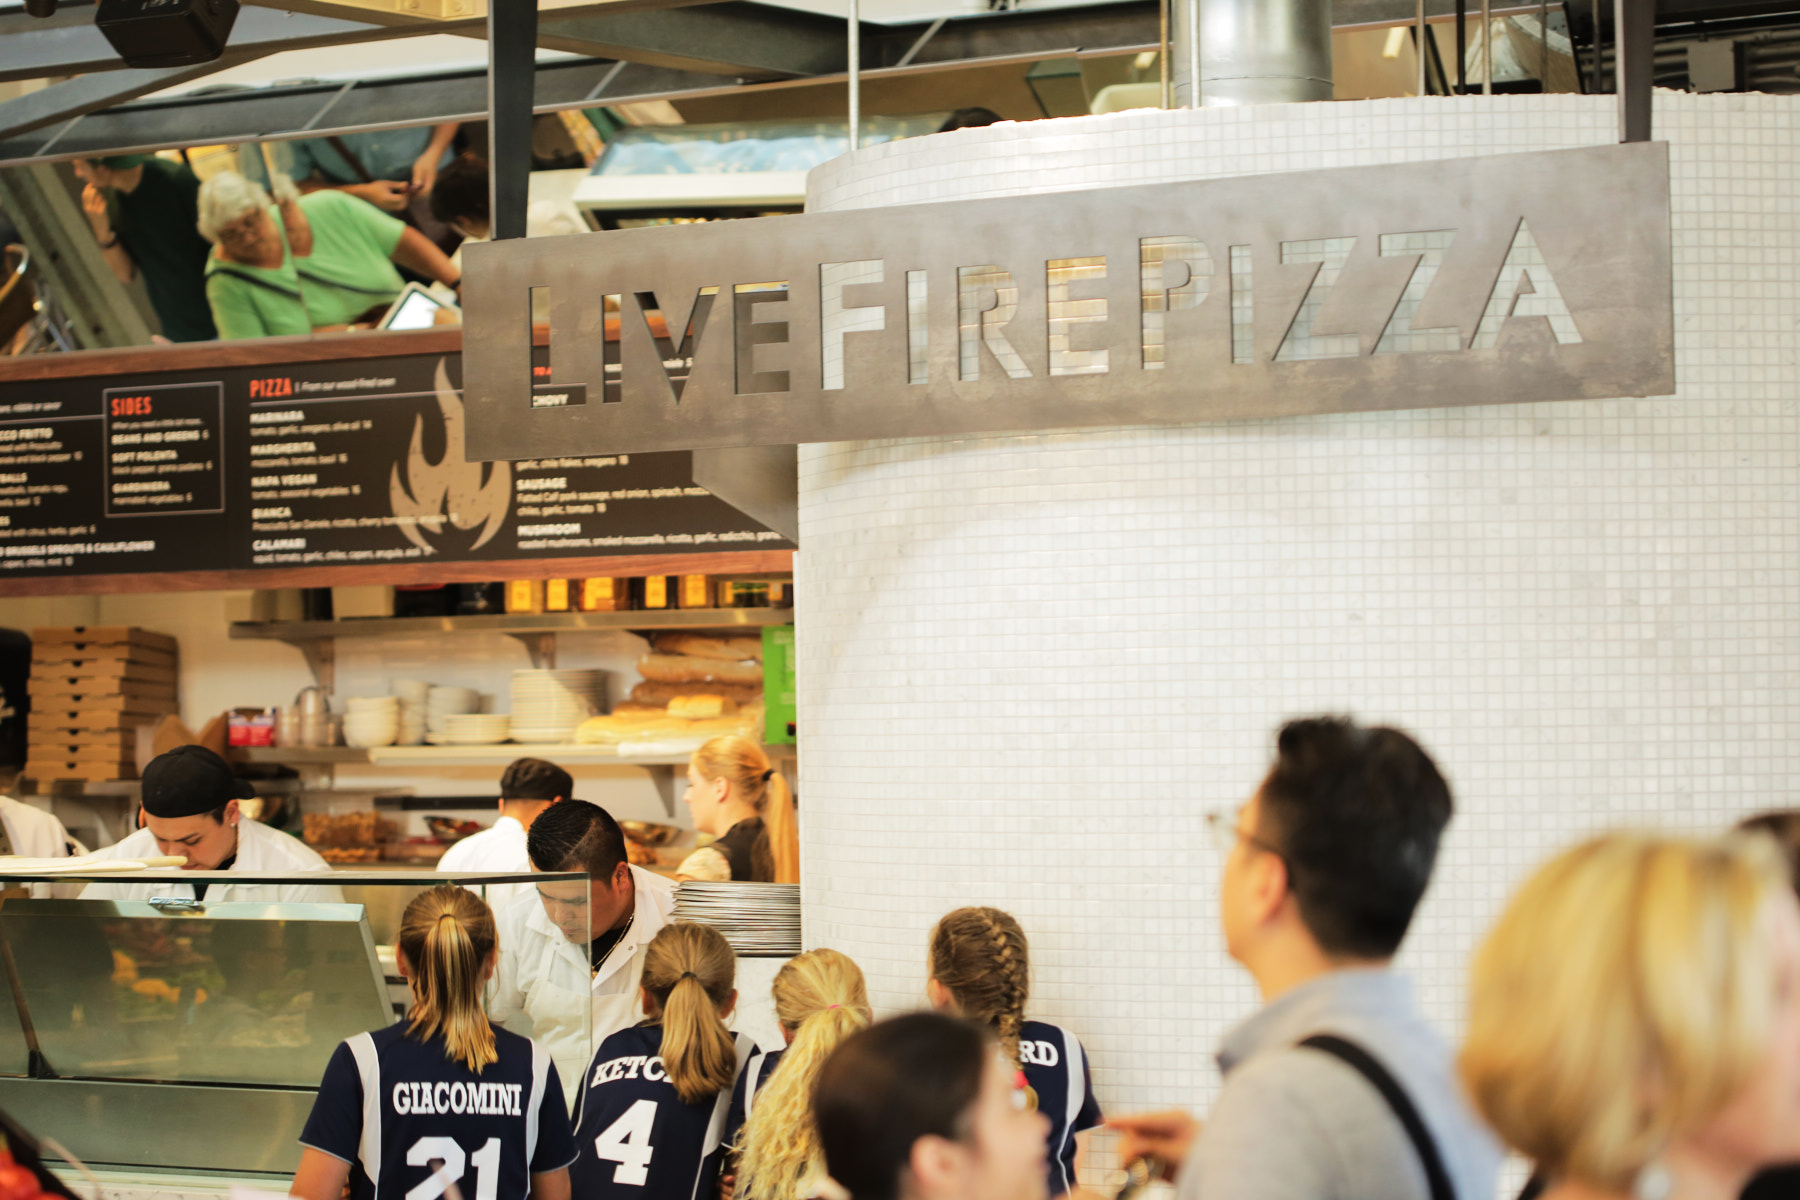 Live Fire Pizza Oxbow Market